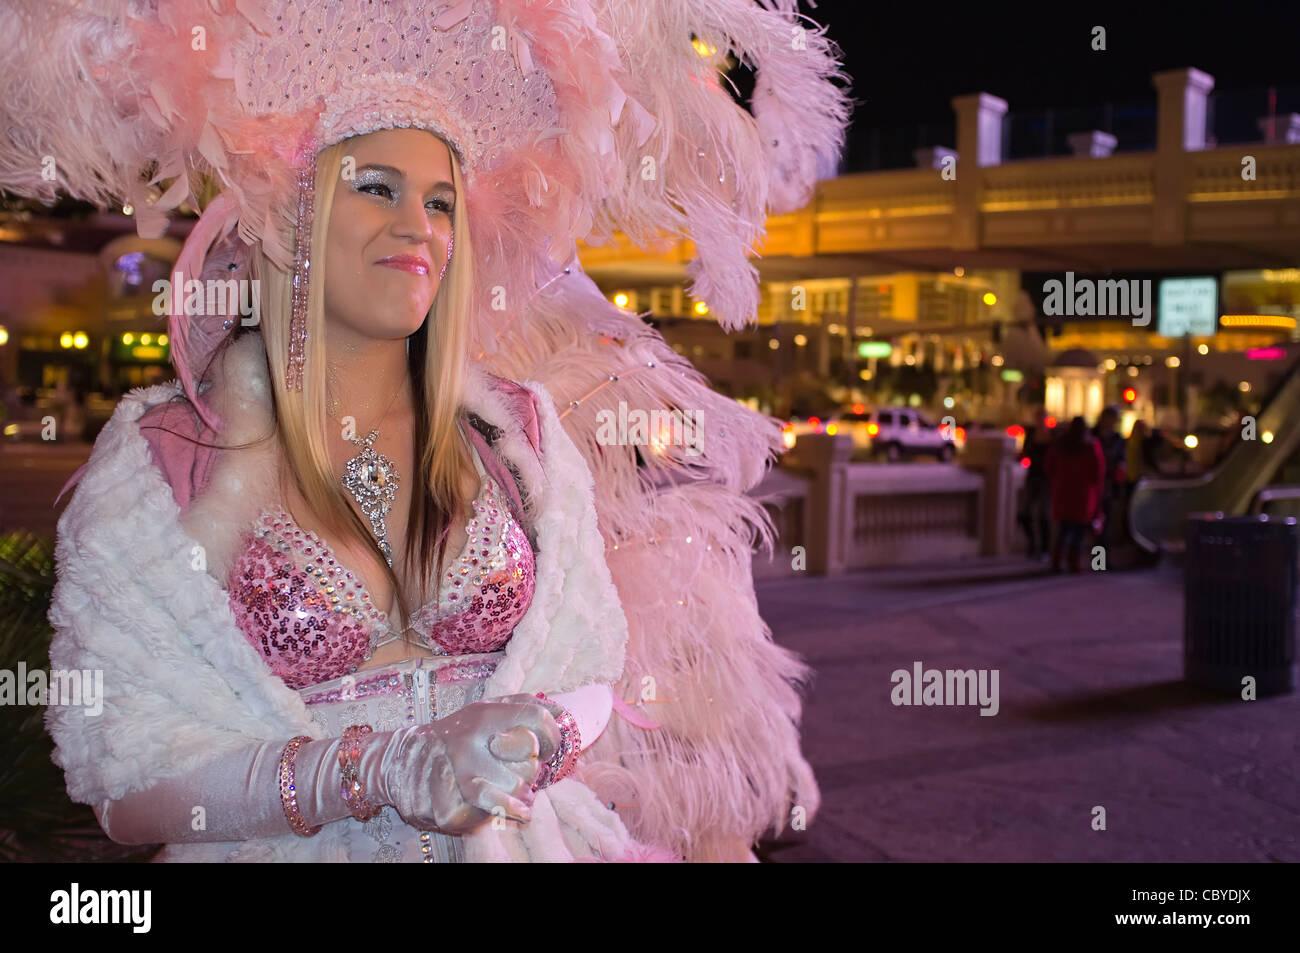 Vegas Showgirl Imágenes De Stock & Vegas Showgirl Fotos De Stock - Alamy